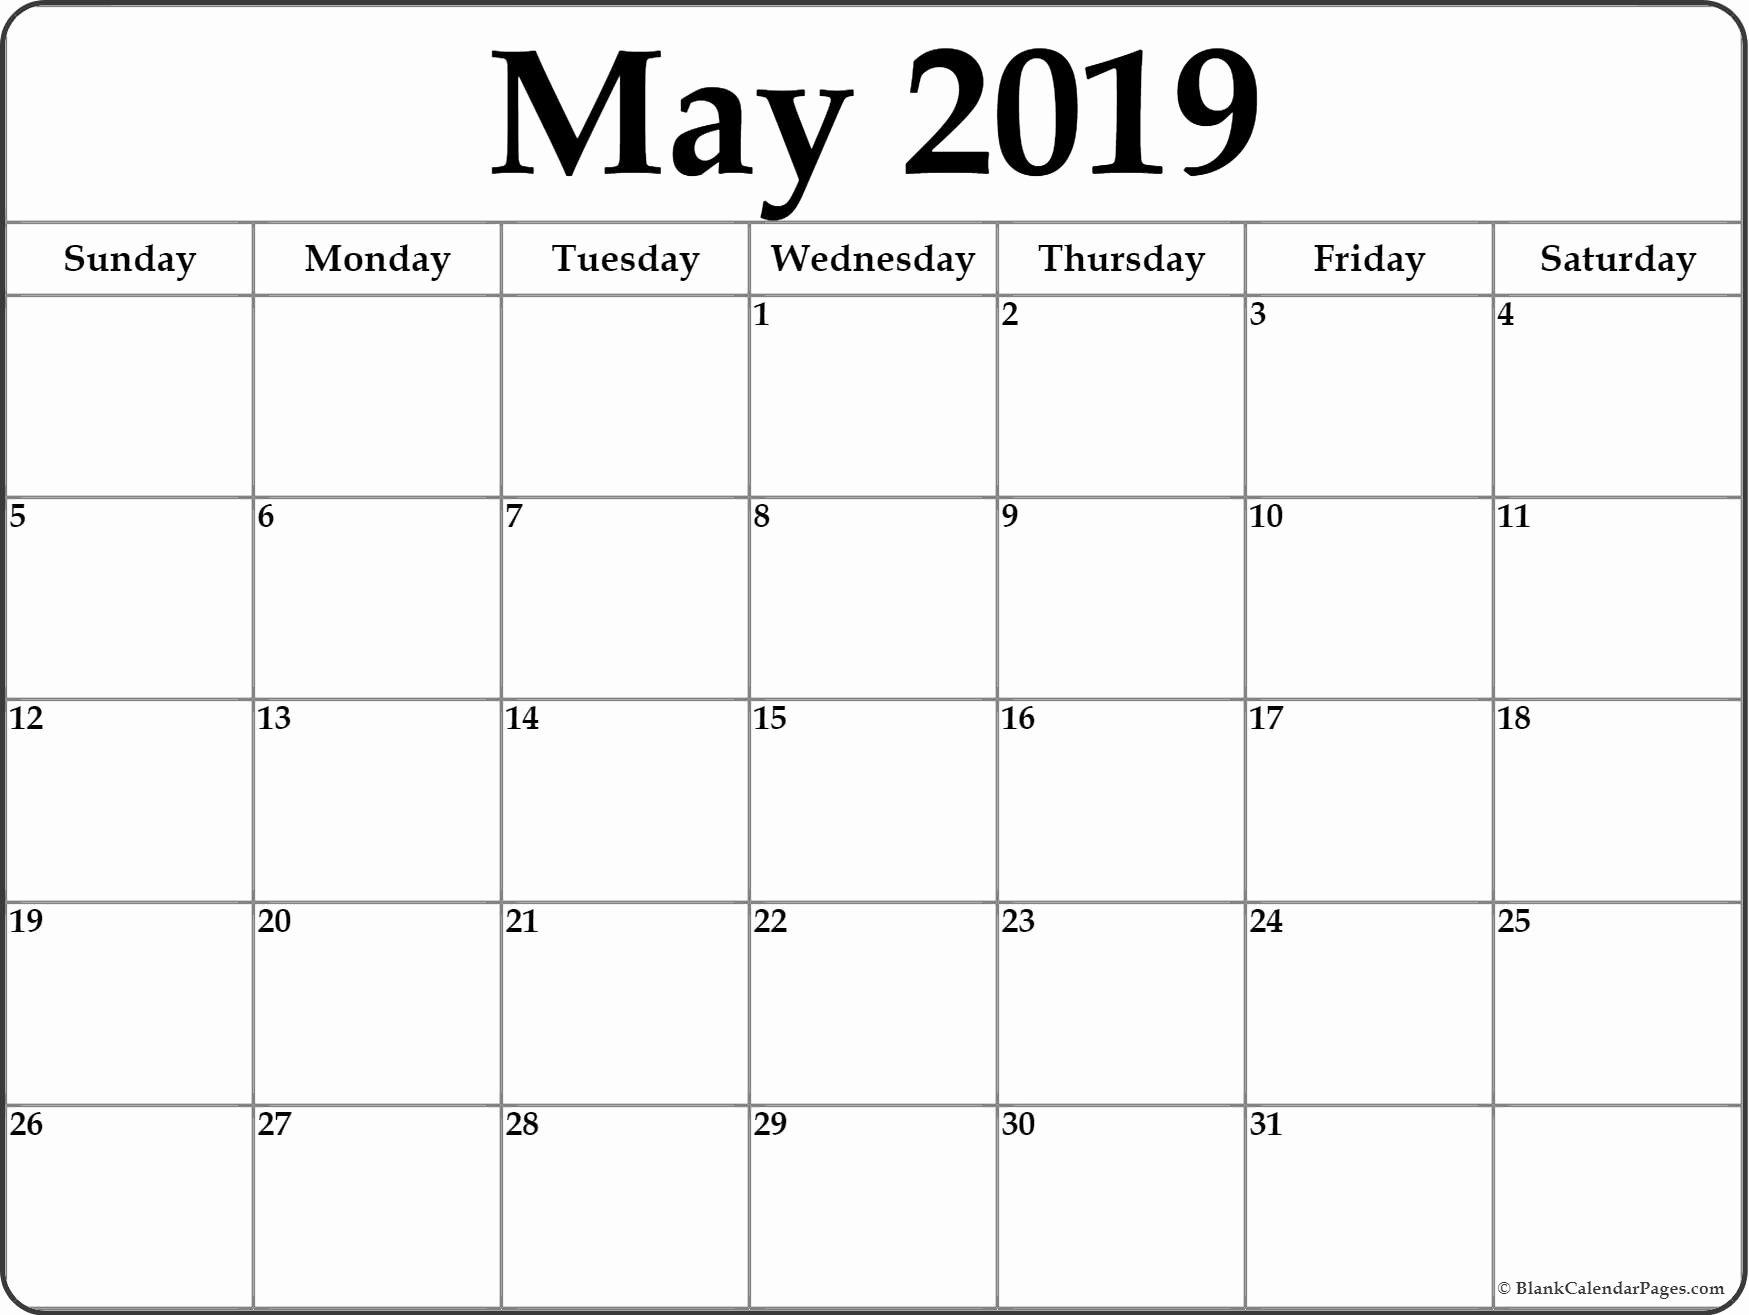 Blank Calendar Template 2019 Awesome May 2019 Blank Calendar Templates